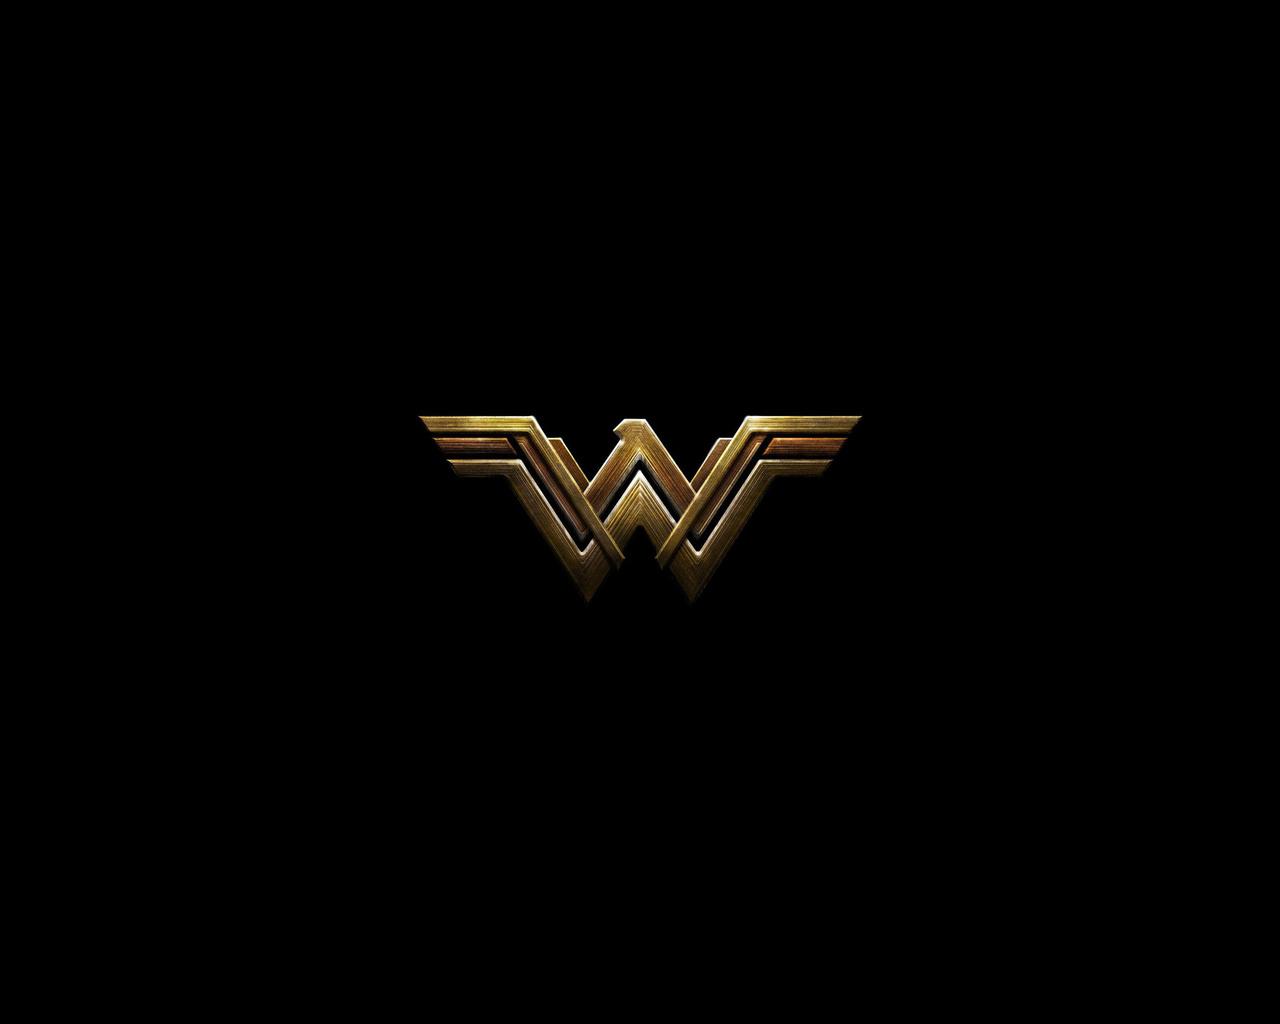 1280x1024 Wonder Woman Movie 1280x1024 Resolution Hd 4k: 1280x1024 Wonder Woman Dark Logo 4k 1280x1024 Resolution